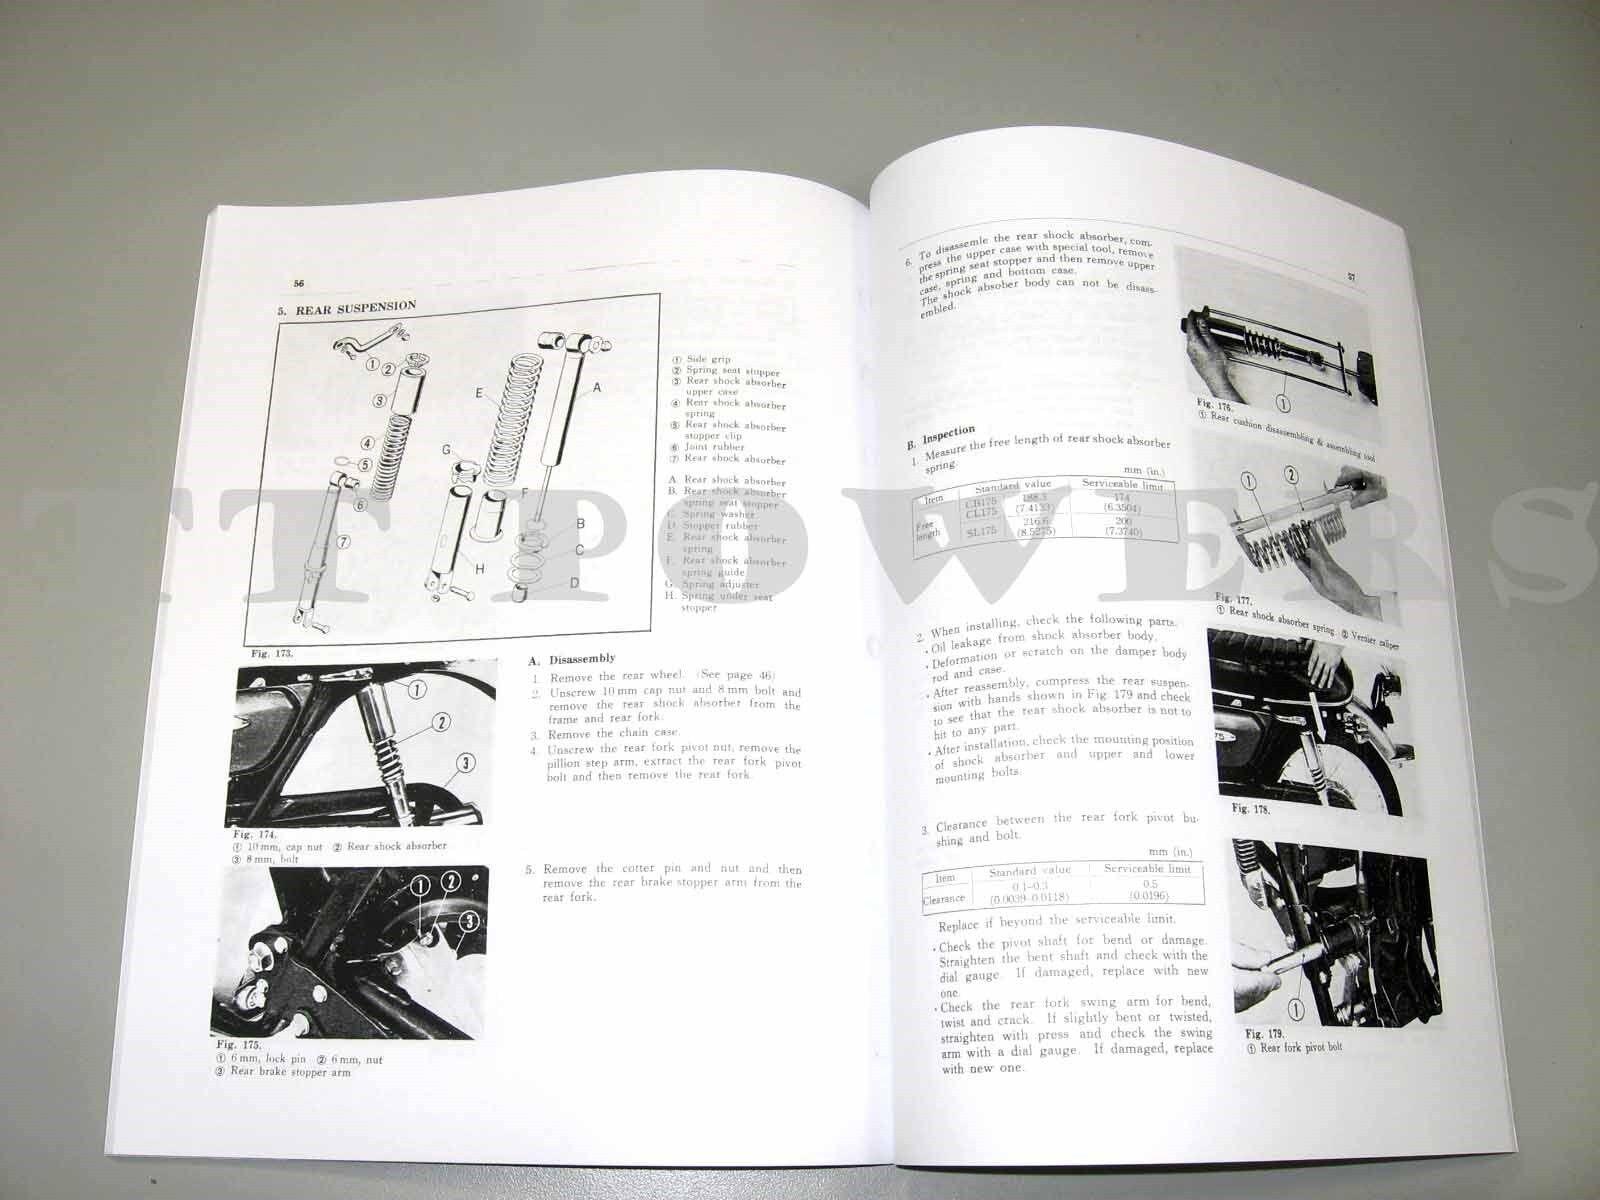 Honda Shop Service Repair Manual 175 Cb175 Cl175 Sl175 Ebay Wiring Diagram Norton Secured Powered By Verisign